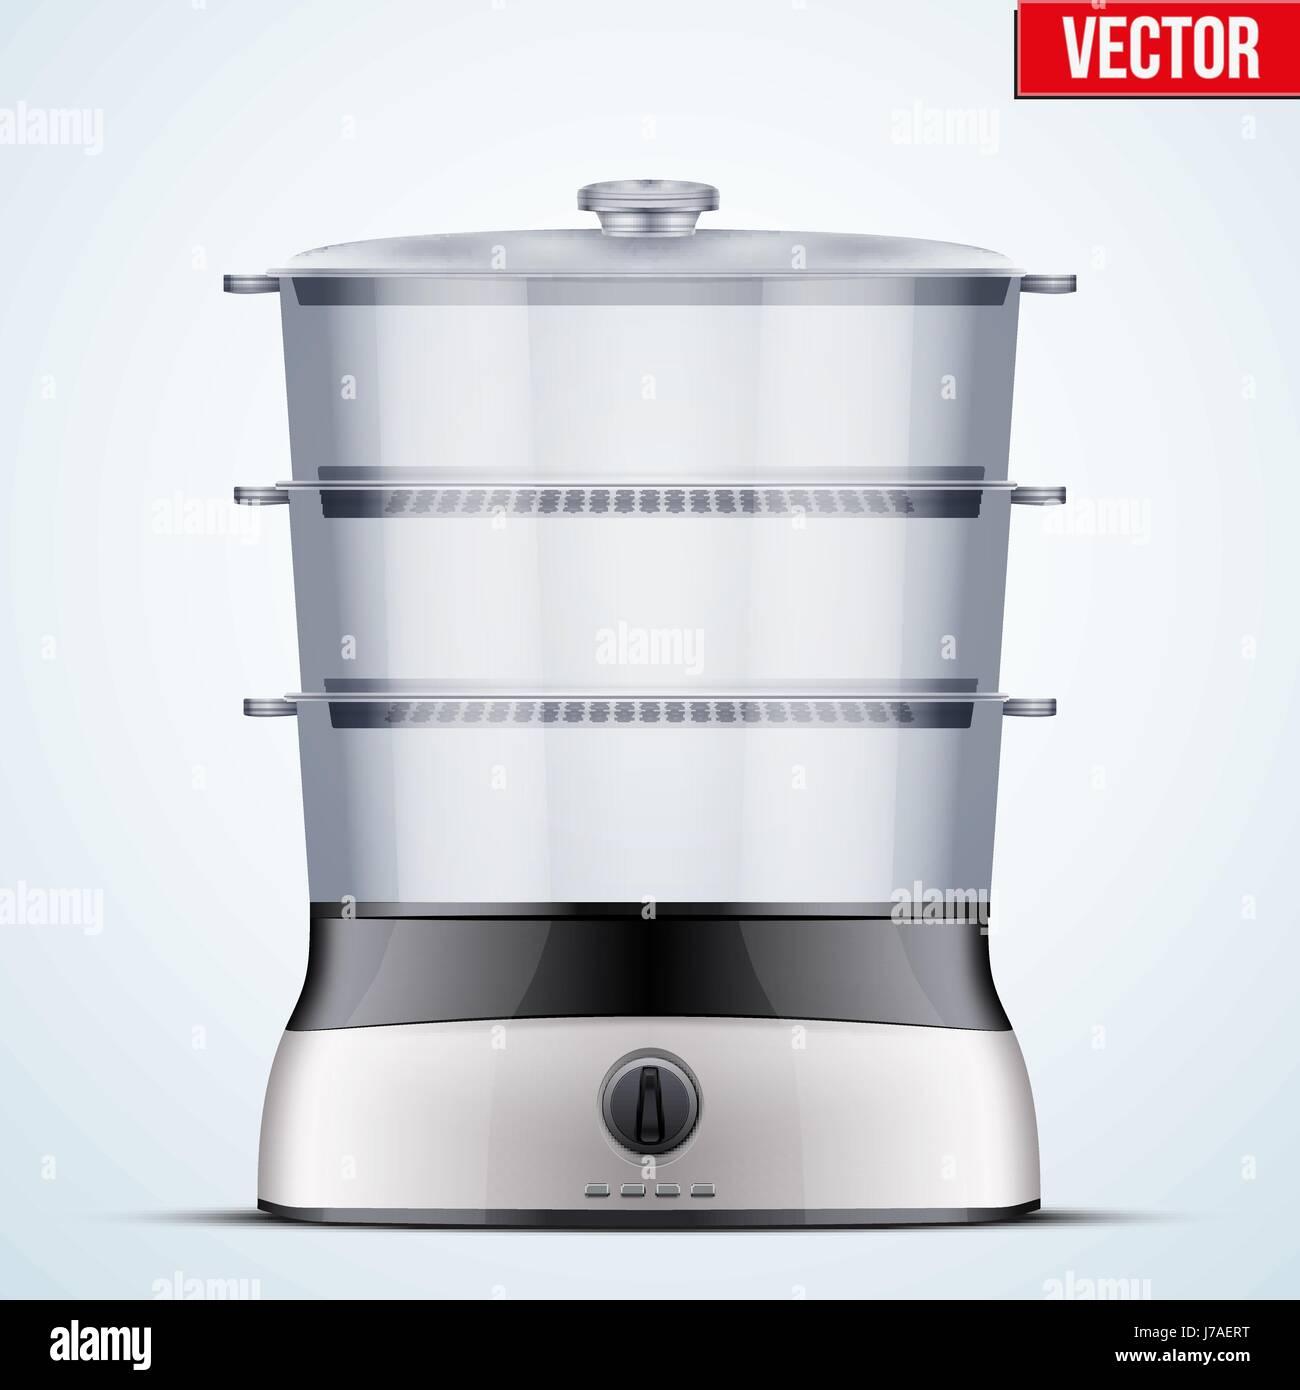 Uncategorized Domestic Kitchen Appliances original electric food steamer or double boiler domestic kitchen appliances and supplies vector illustration